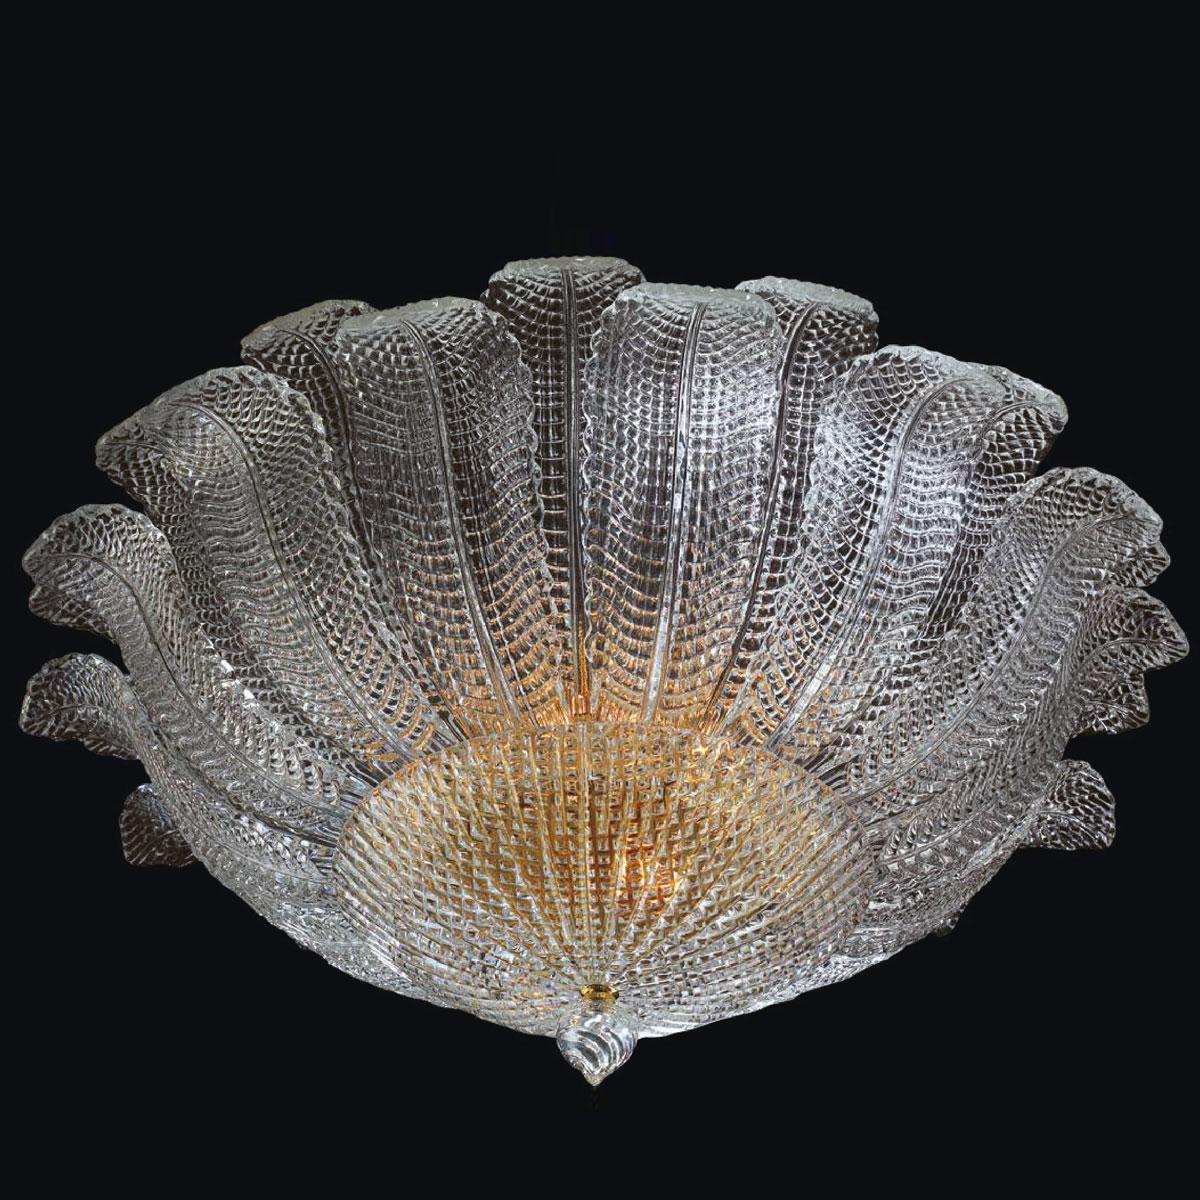 """Yara"" Murano glass ceiling light - 6 lights - transparent"